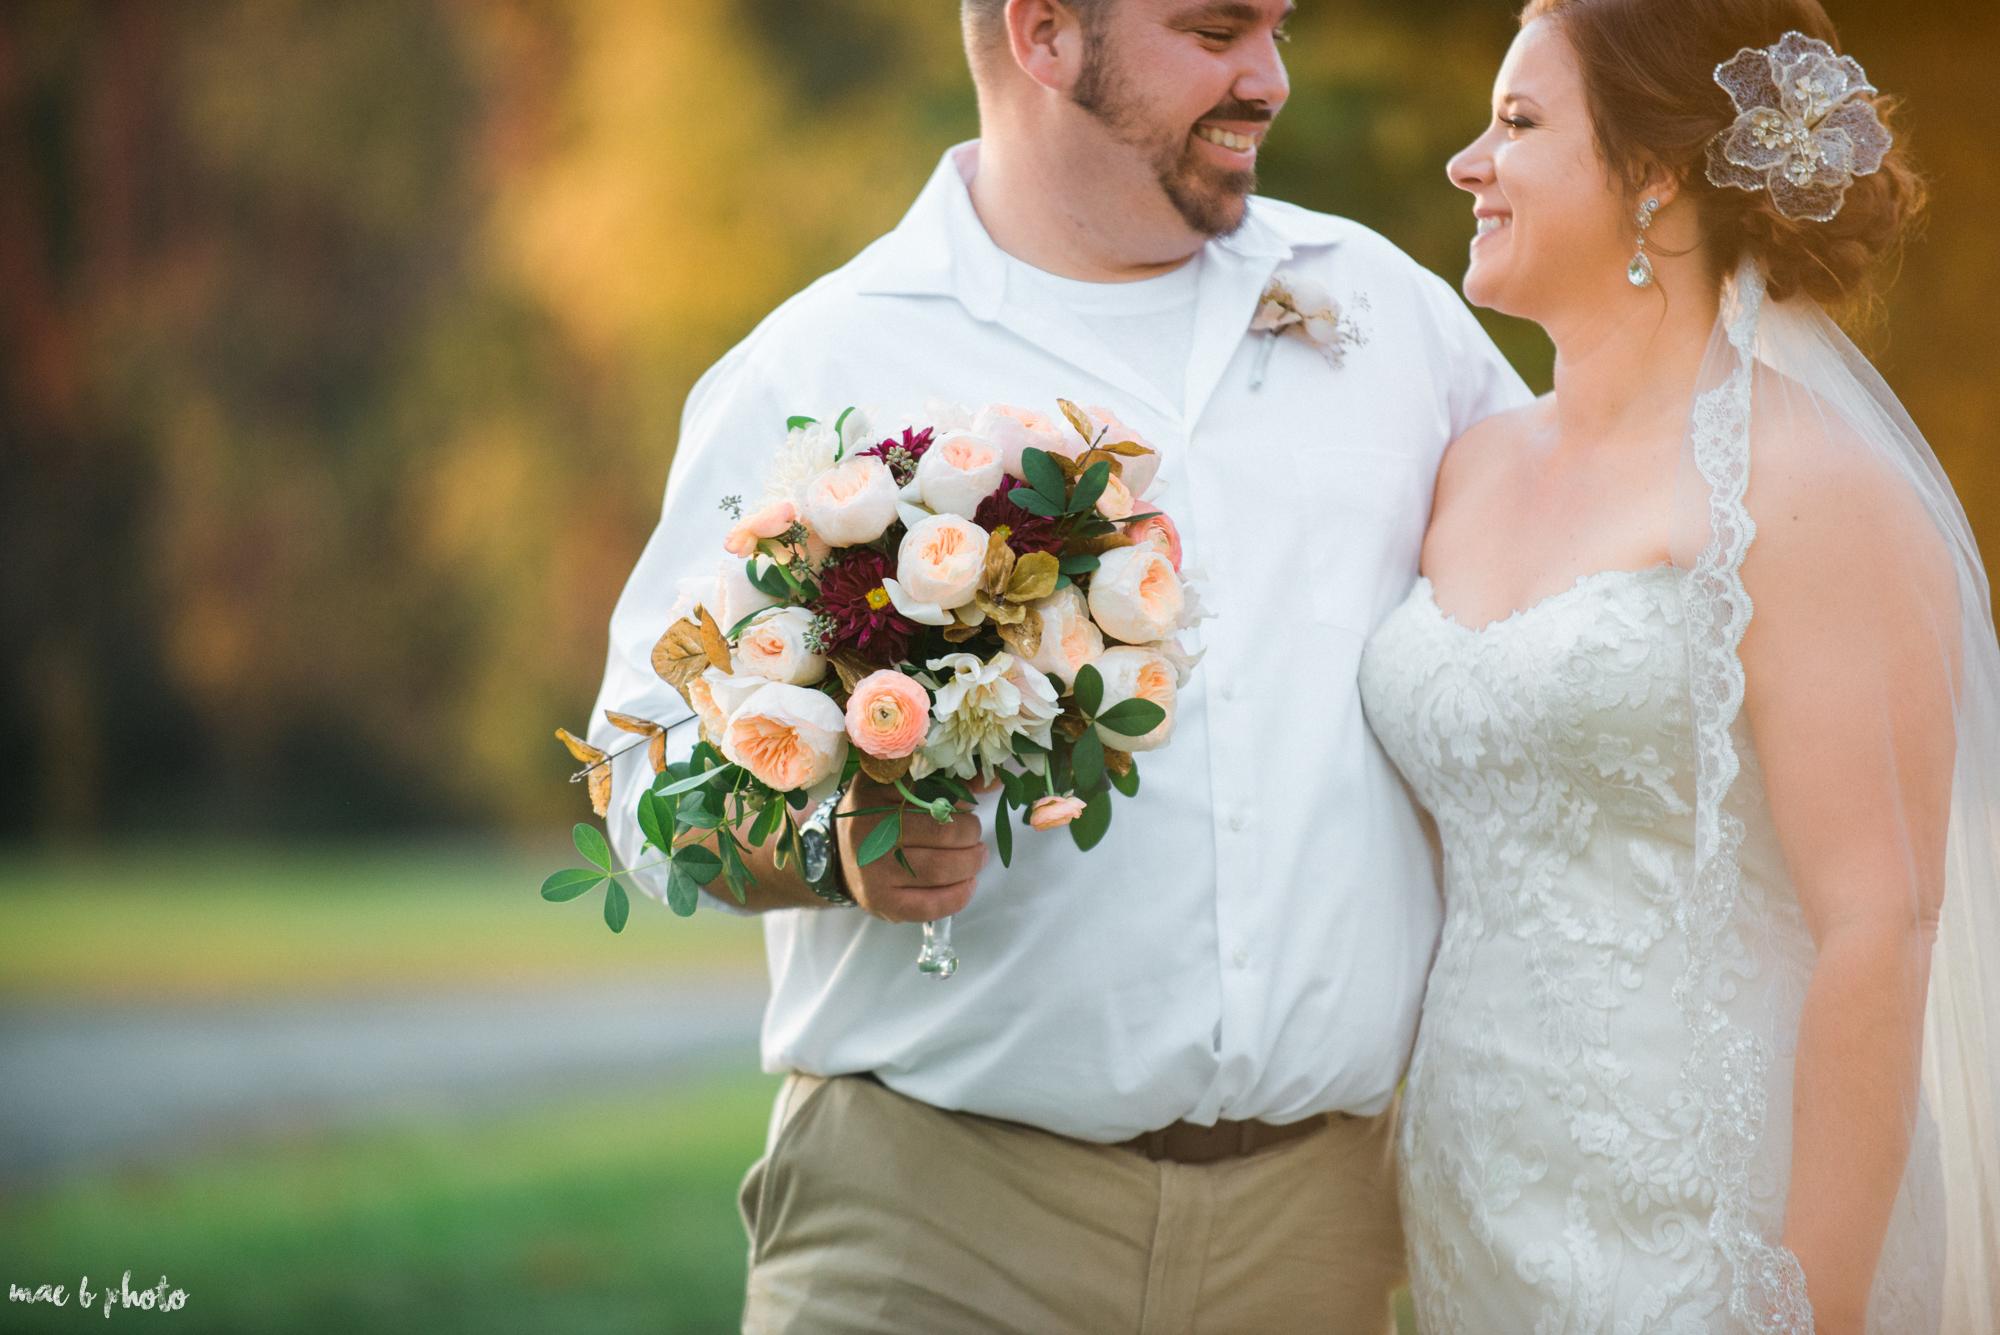 Sarah & Dustin's Rustic Chic Barn Wedding at Hartford Hill Winery in Hartford, Ohio by Mae B Photo-84.jpg